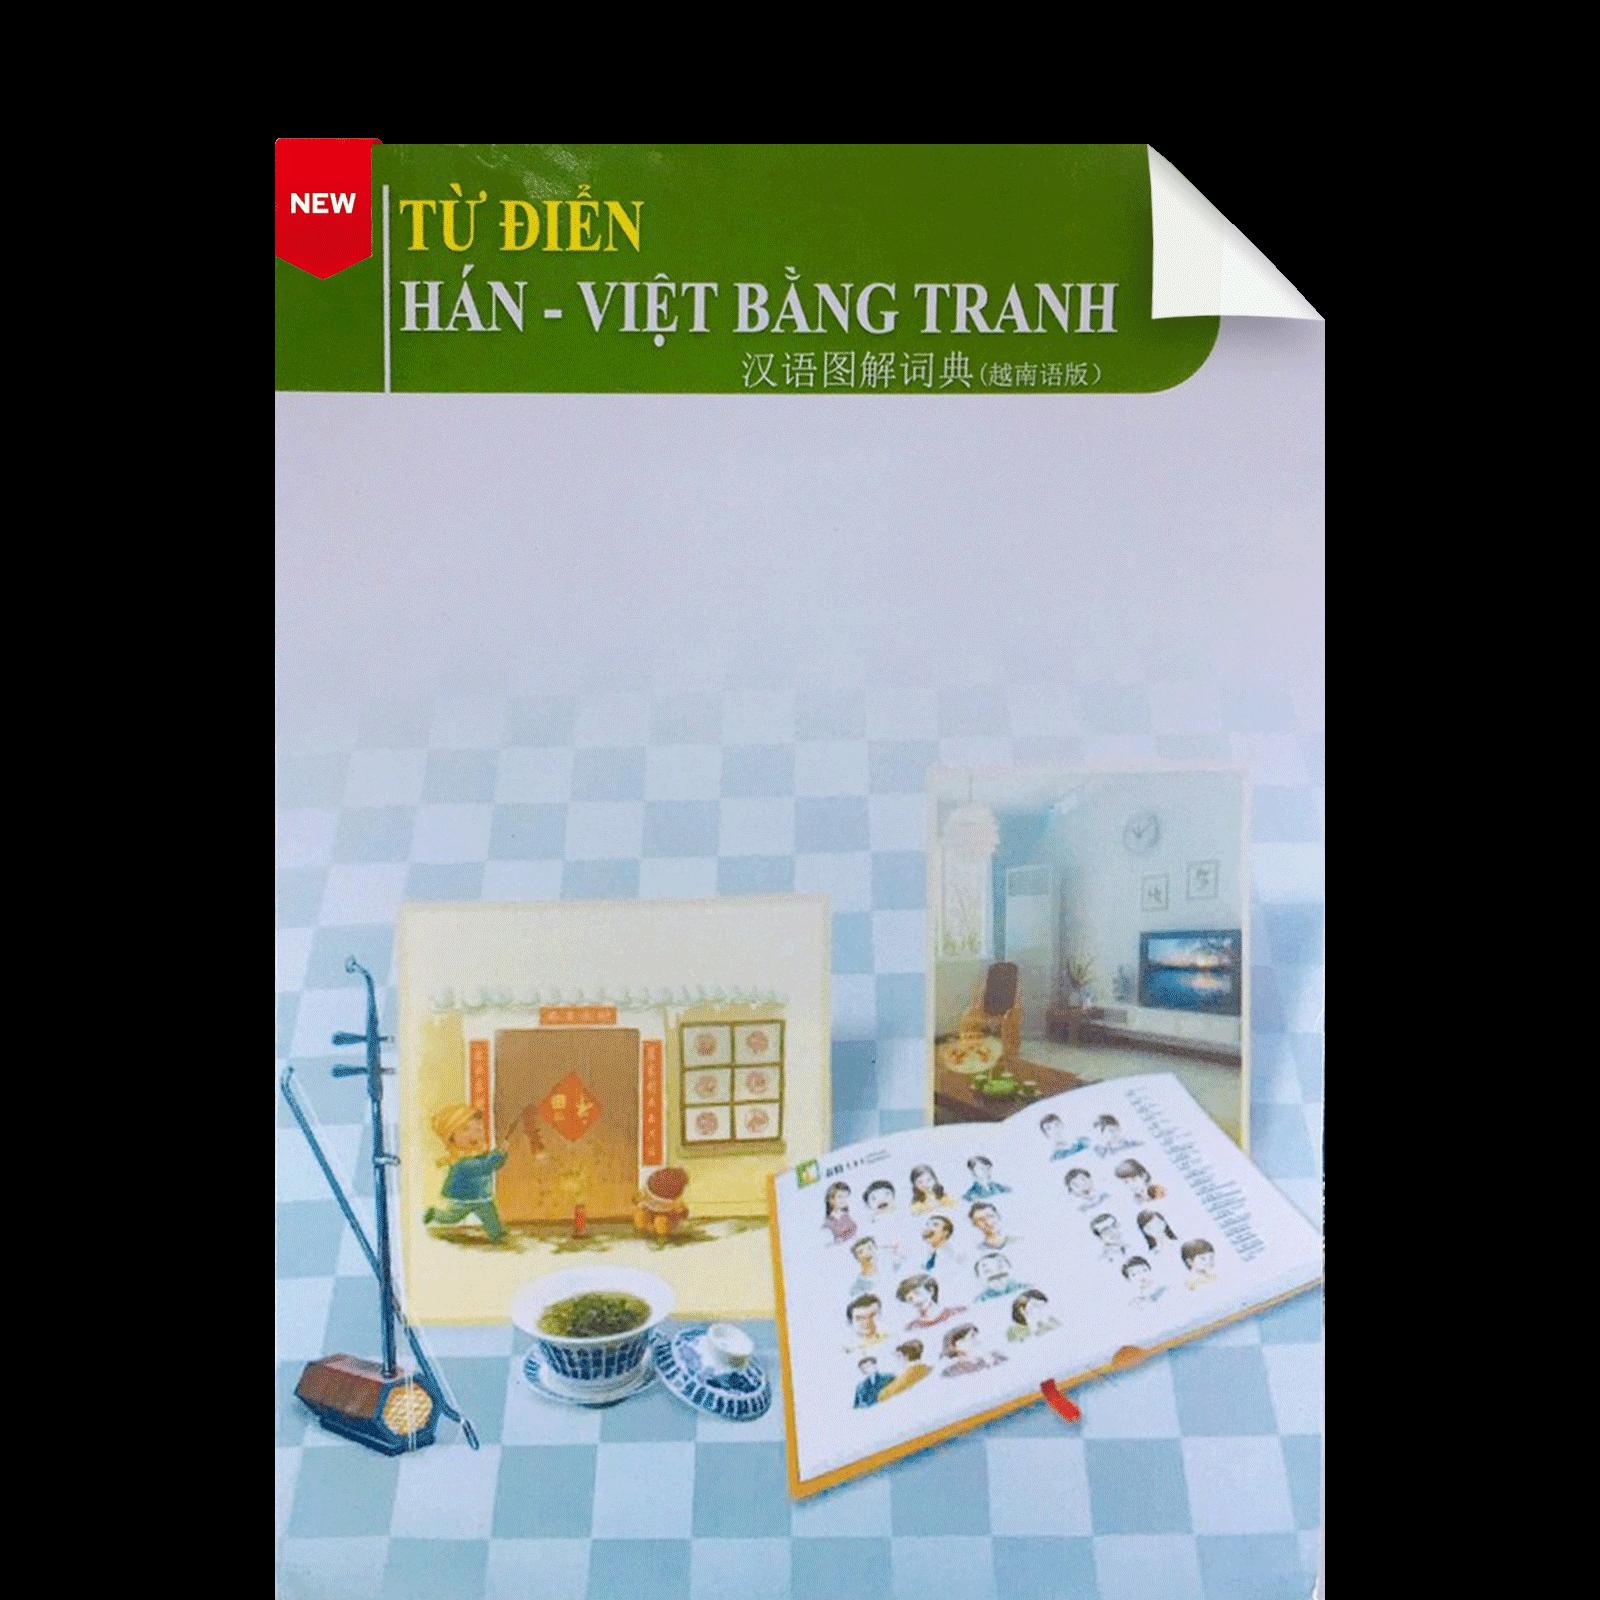 Tudien Hanviet Bangtranh Hanyu Tujie Cidian